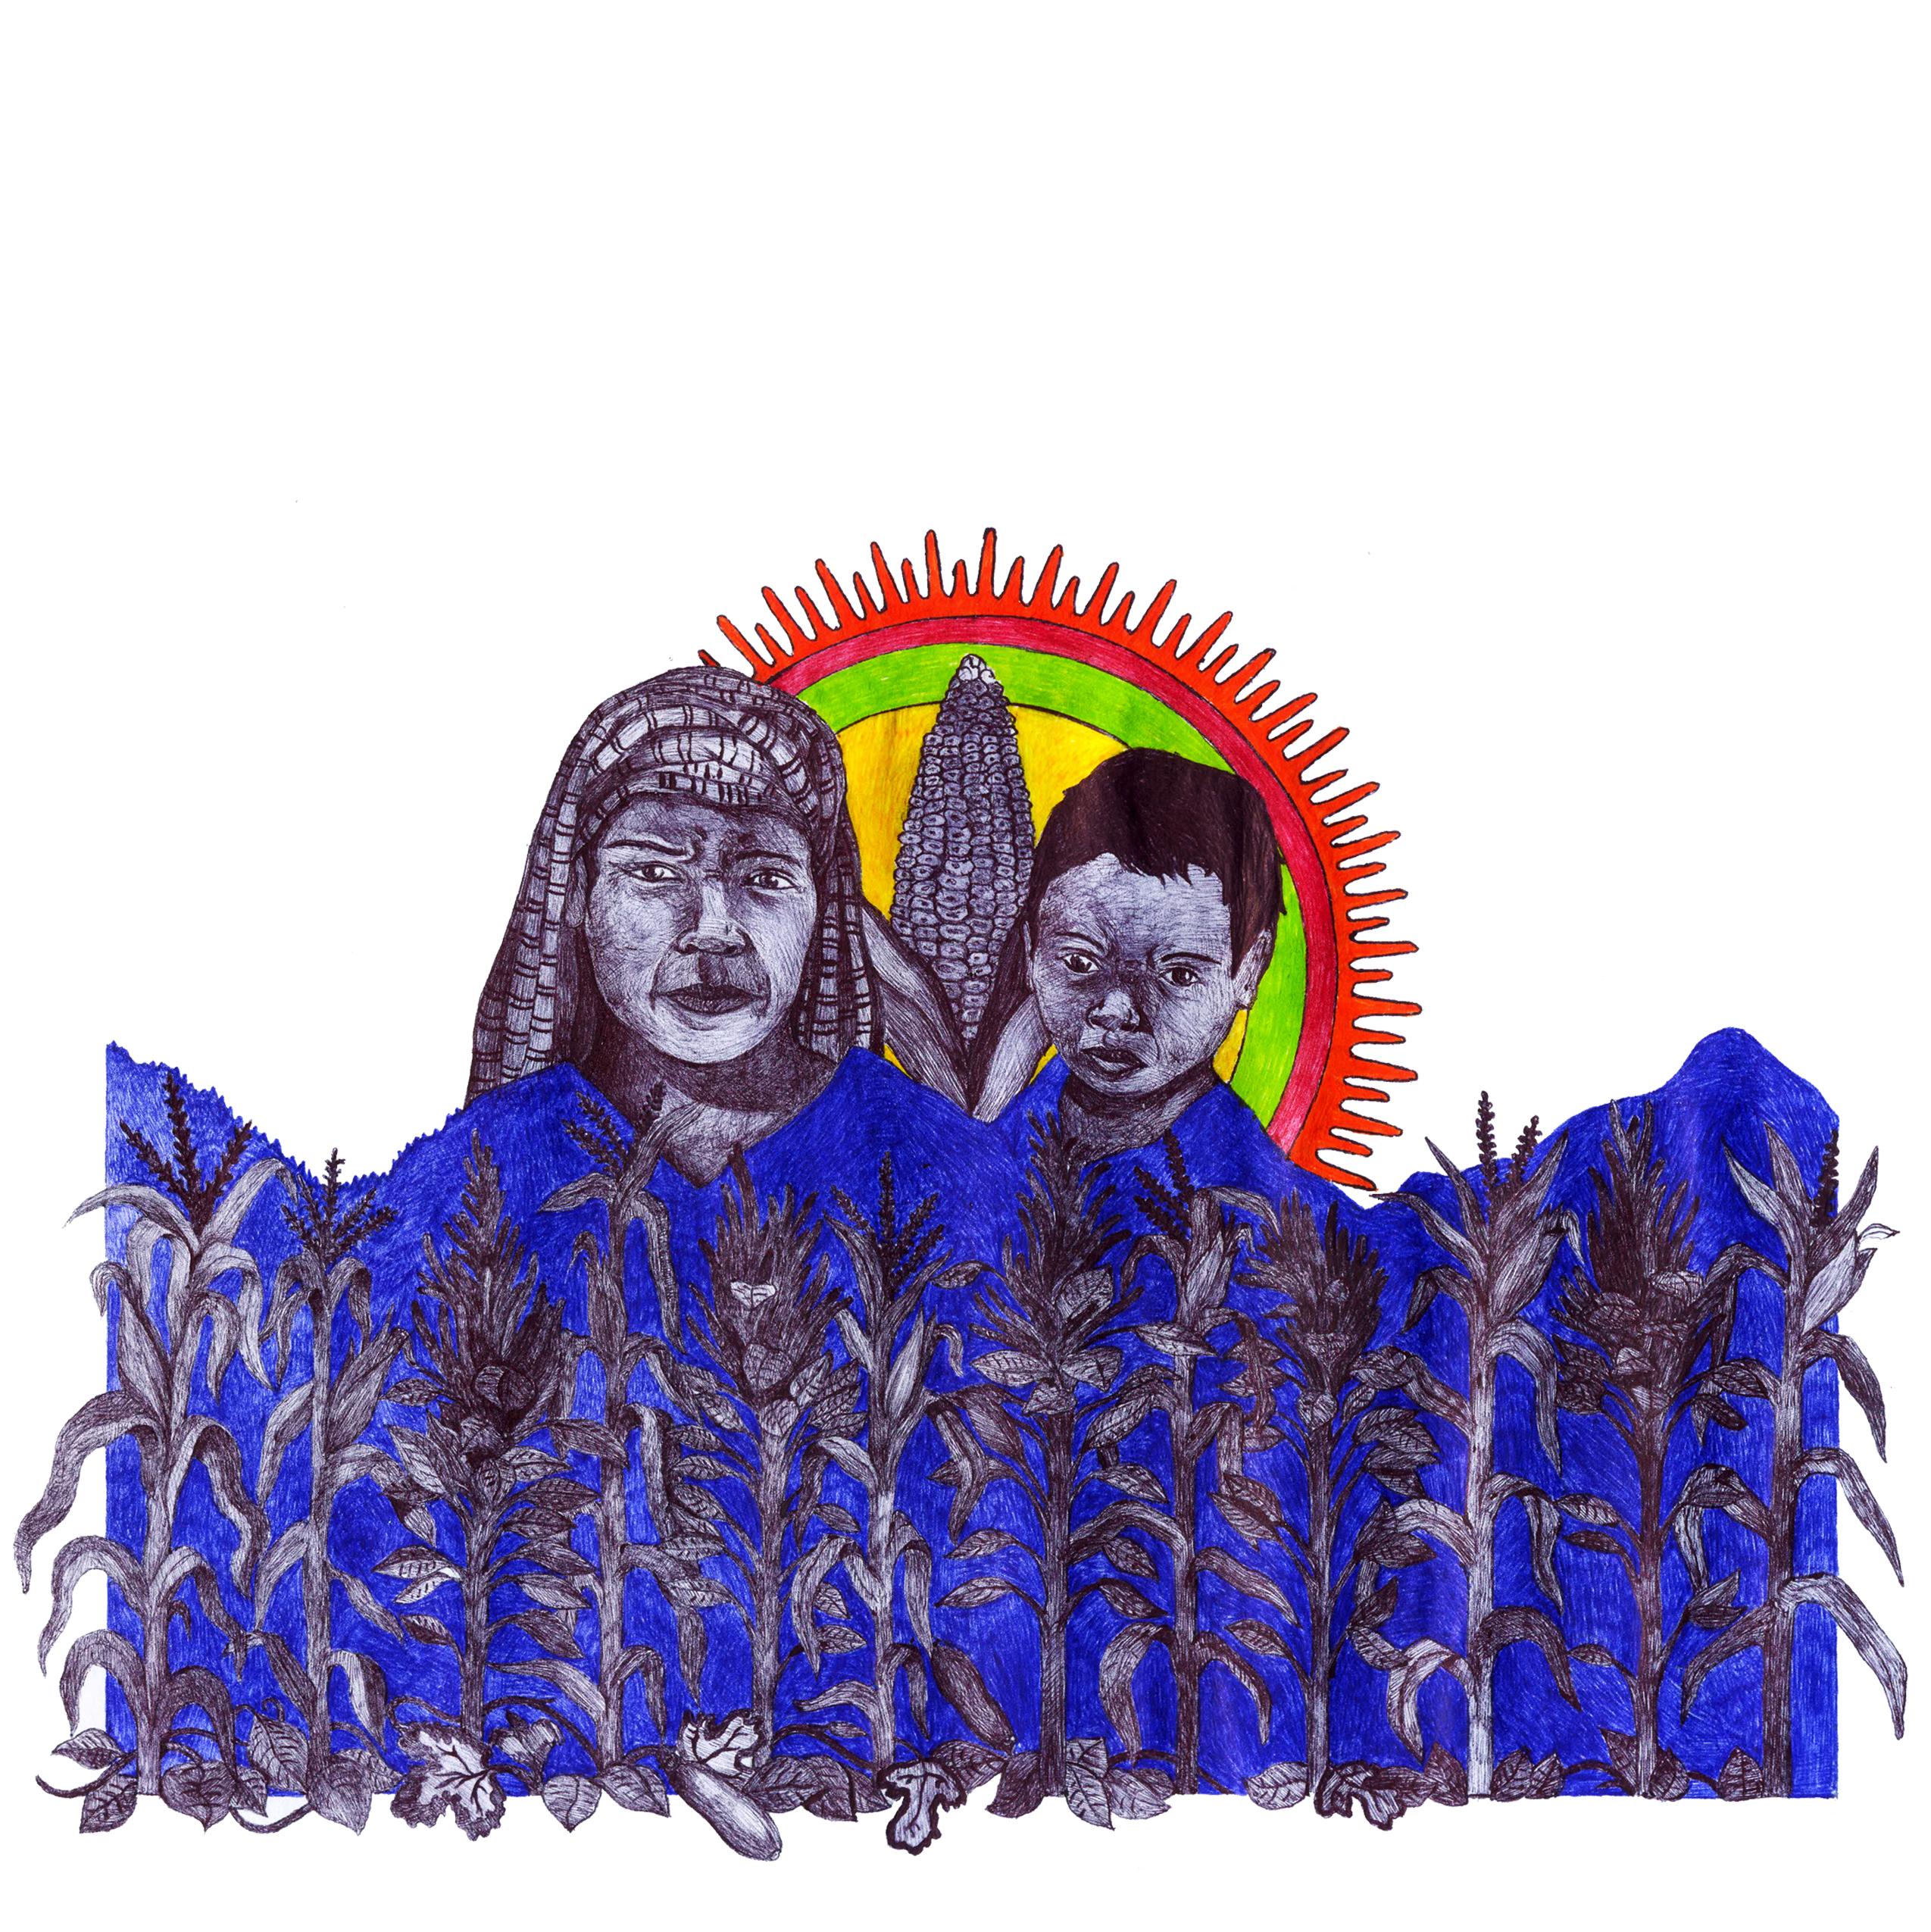 Ilustración por Mario Cano Domínguez